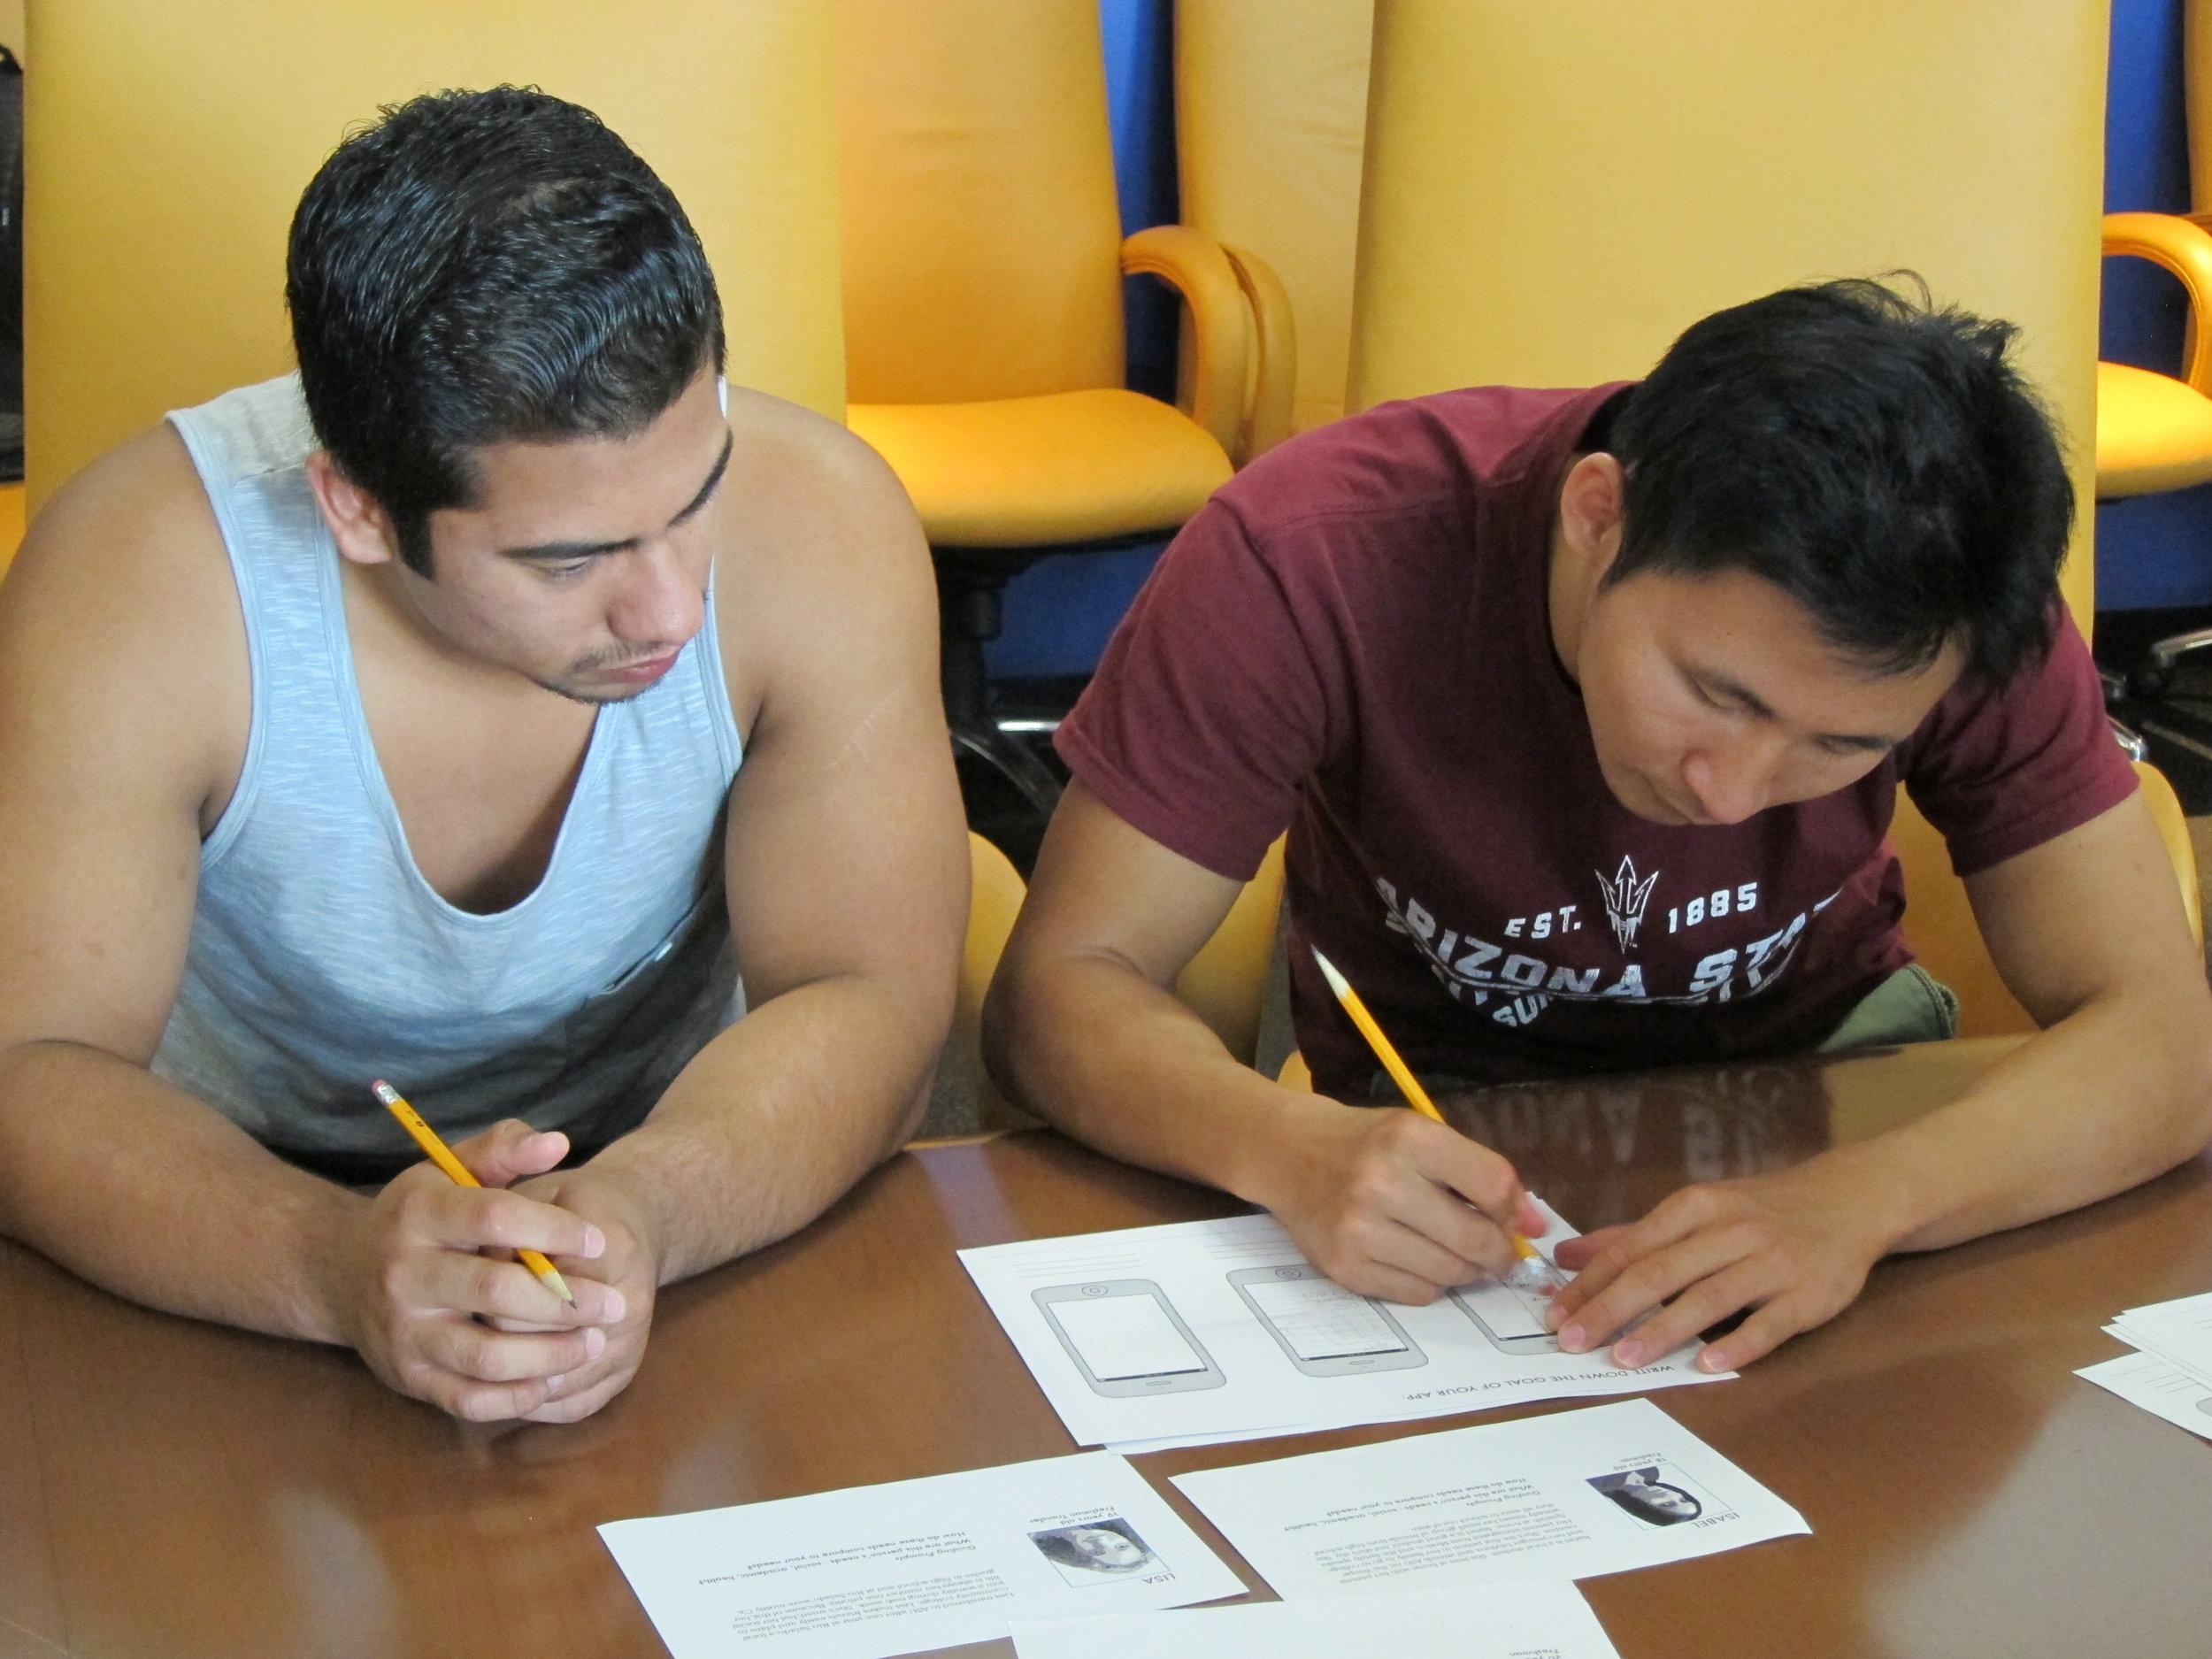 Facilitating wireframing activity with Arizona State University Students